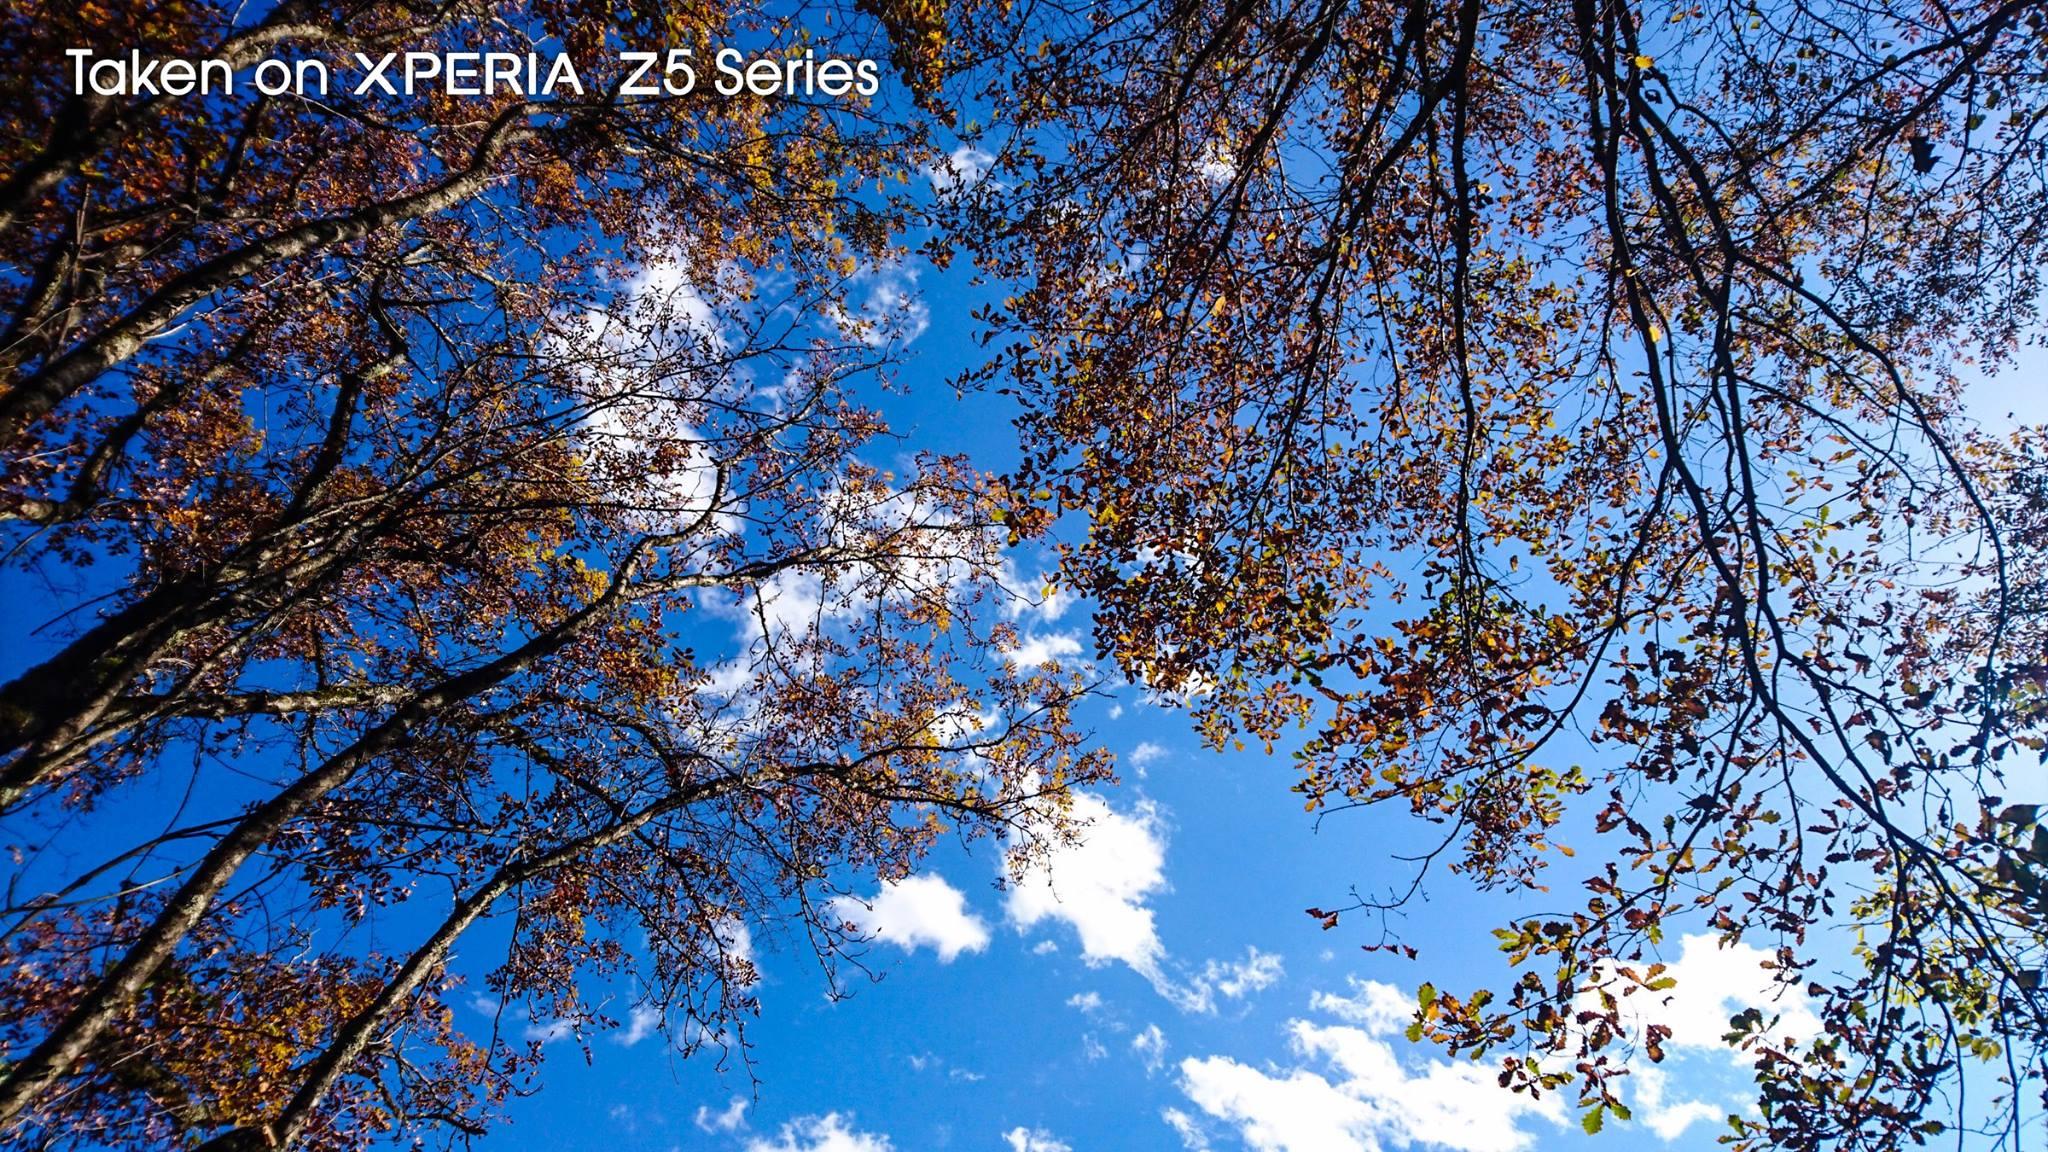 красивые фото с камеры Sony Xperia Z5 и Z5 Compact